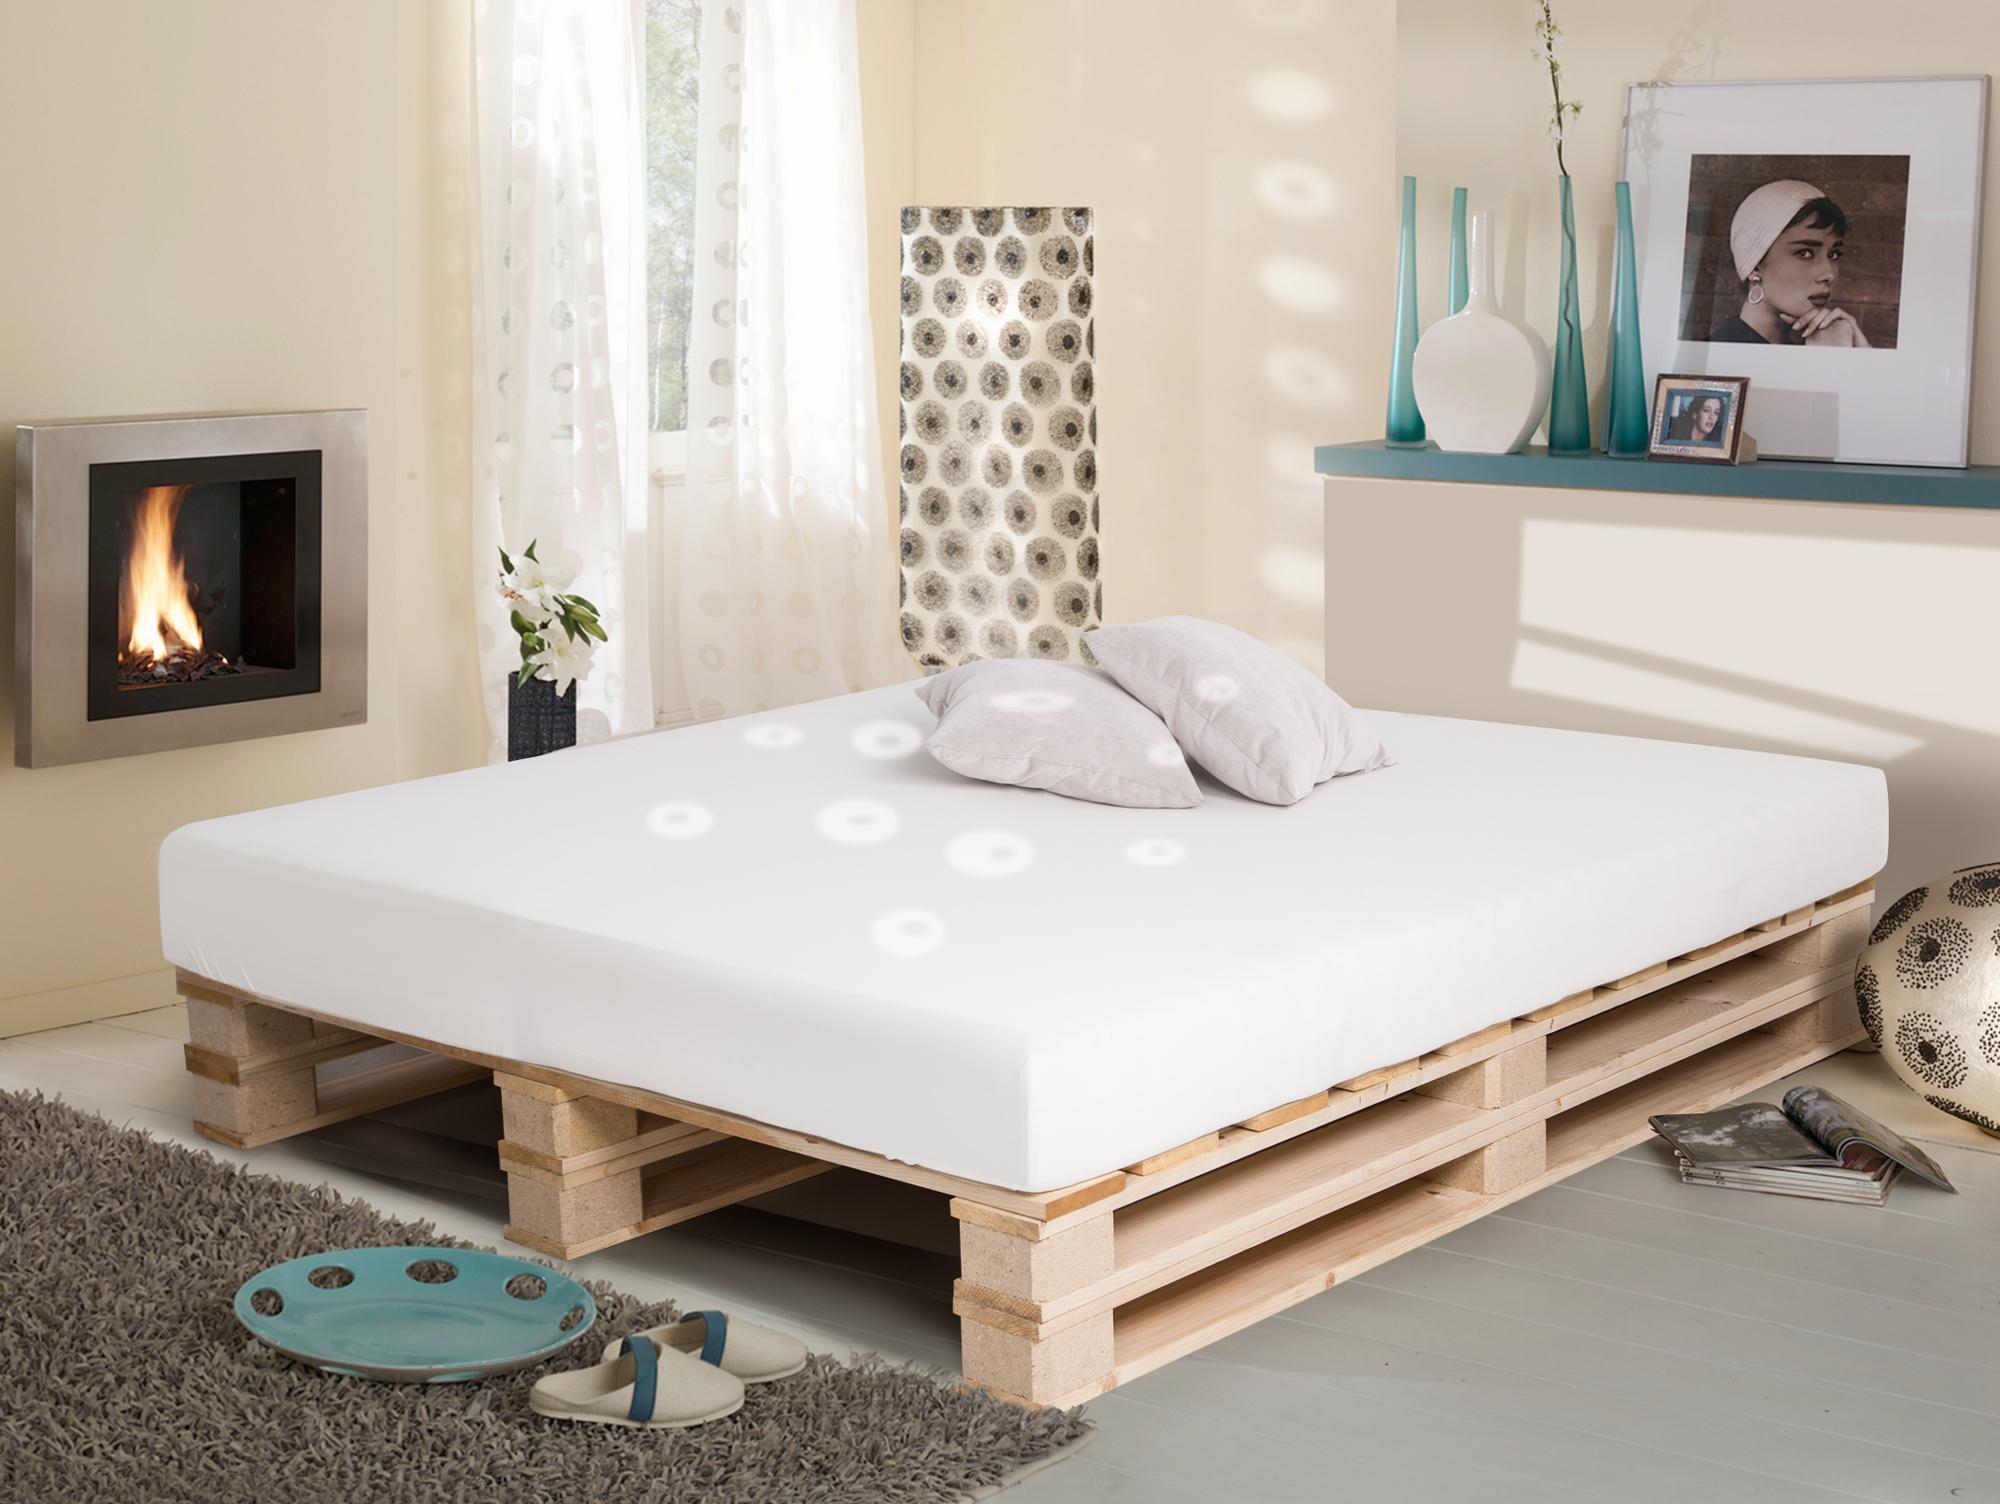 paletti duo massivholzbett palettenbett 160 x 200 cm. Black Bedroom Furniture Sets. Home Design Ideas